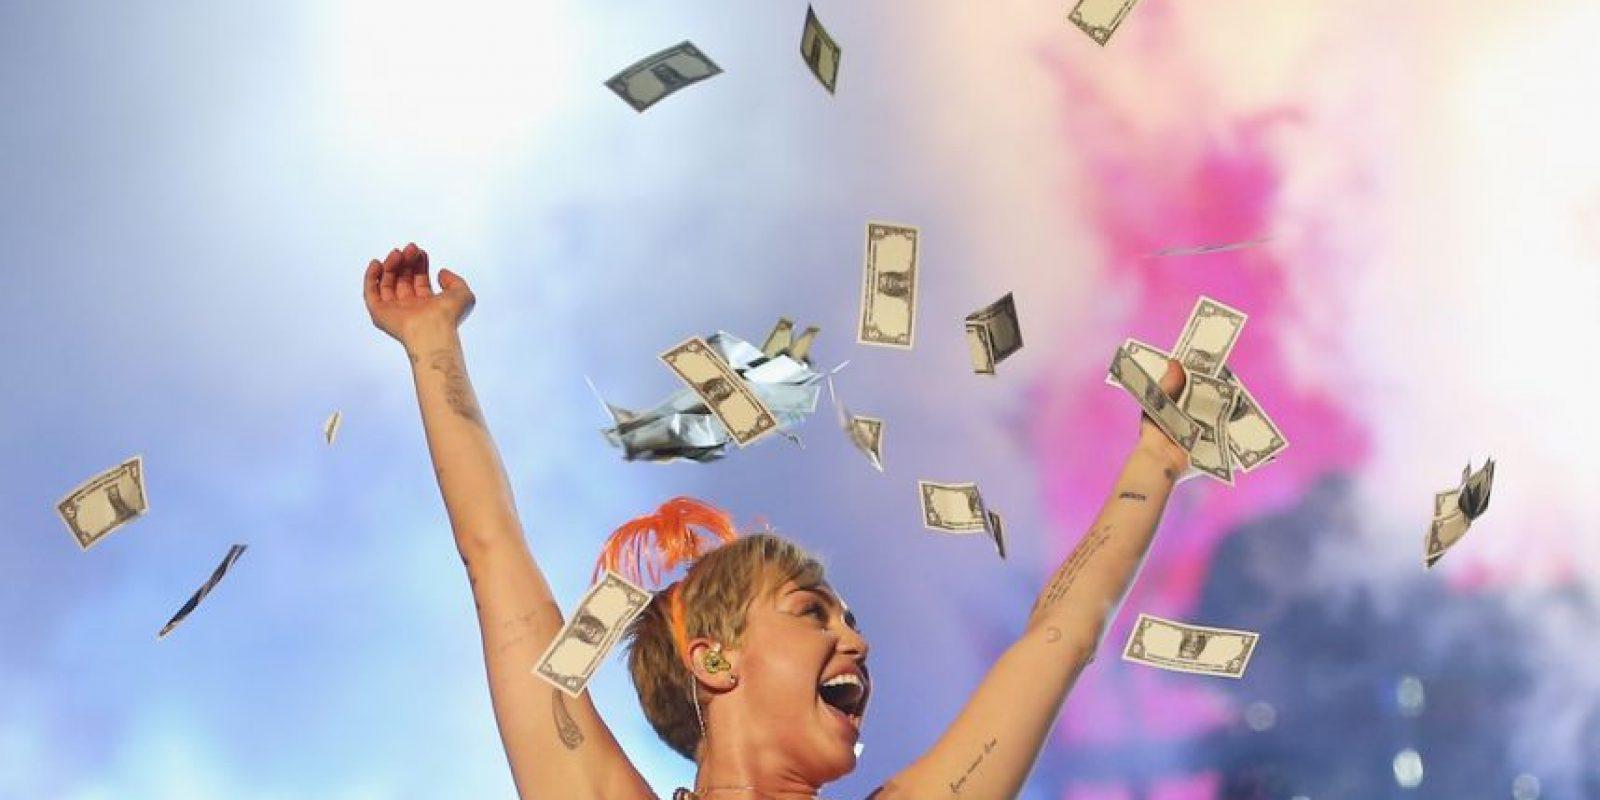 Antes de esta carta, Miley consideraba a Sinead O' Connor como un modelo a seguir. Foto:Getty Images